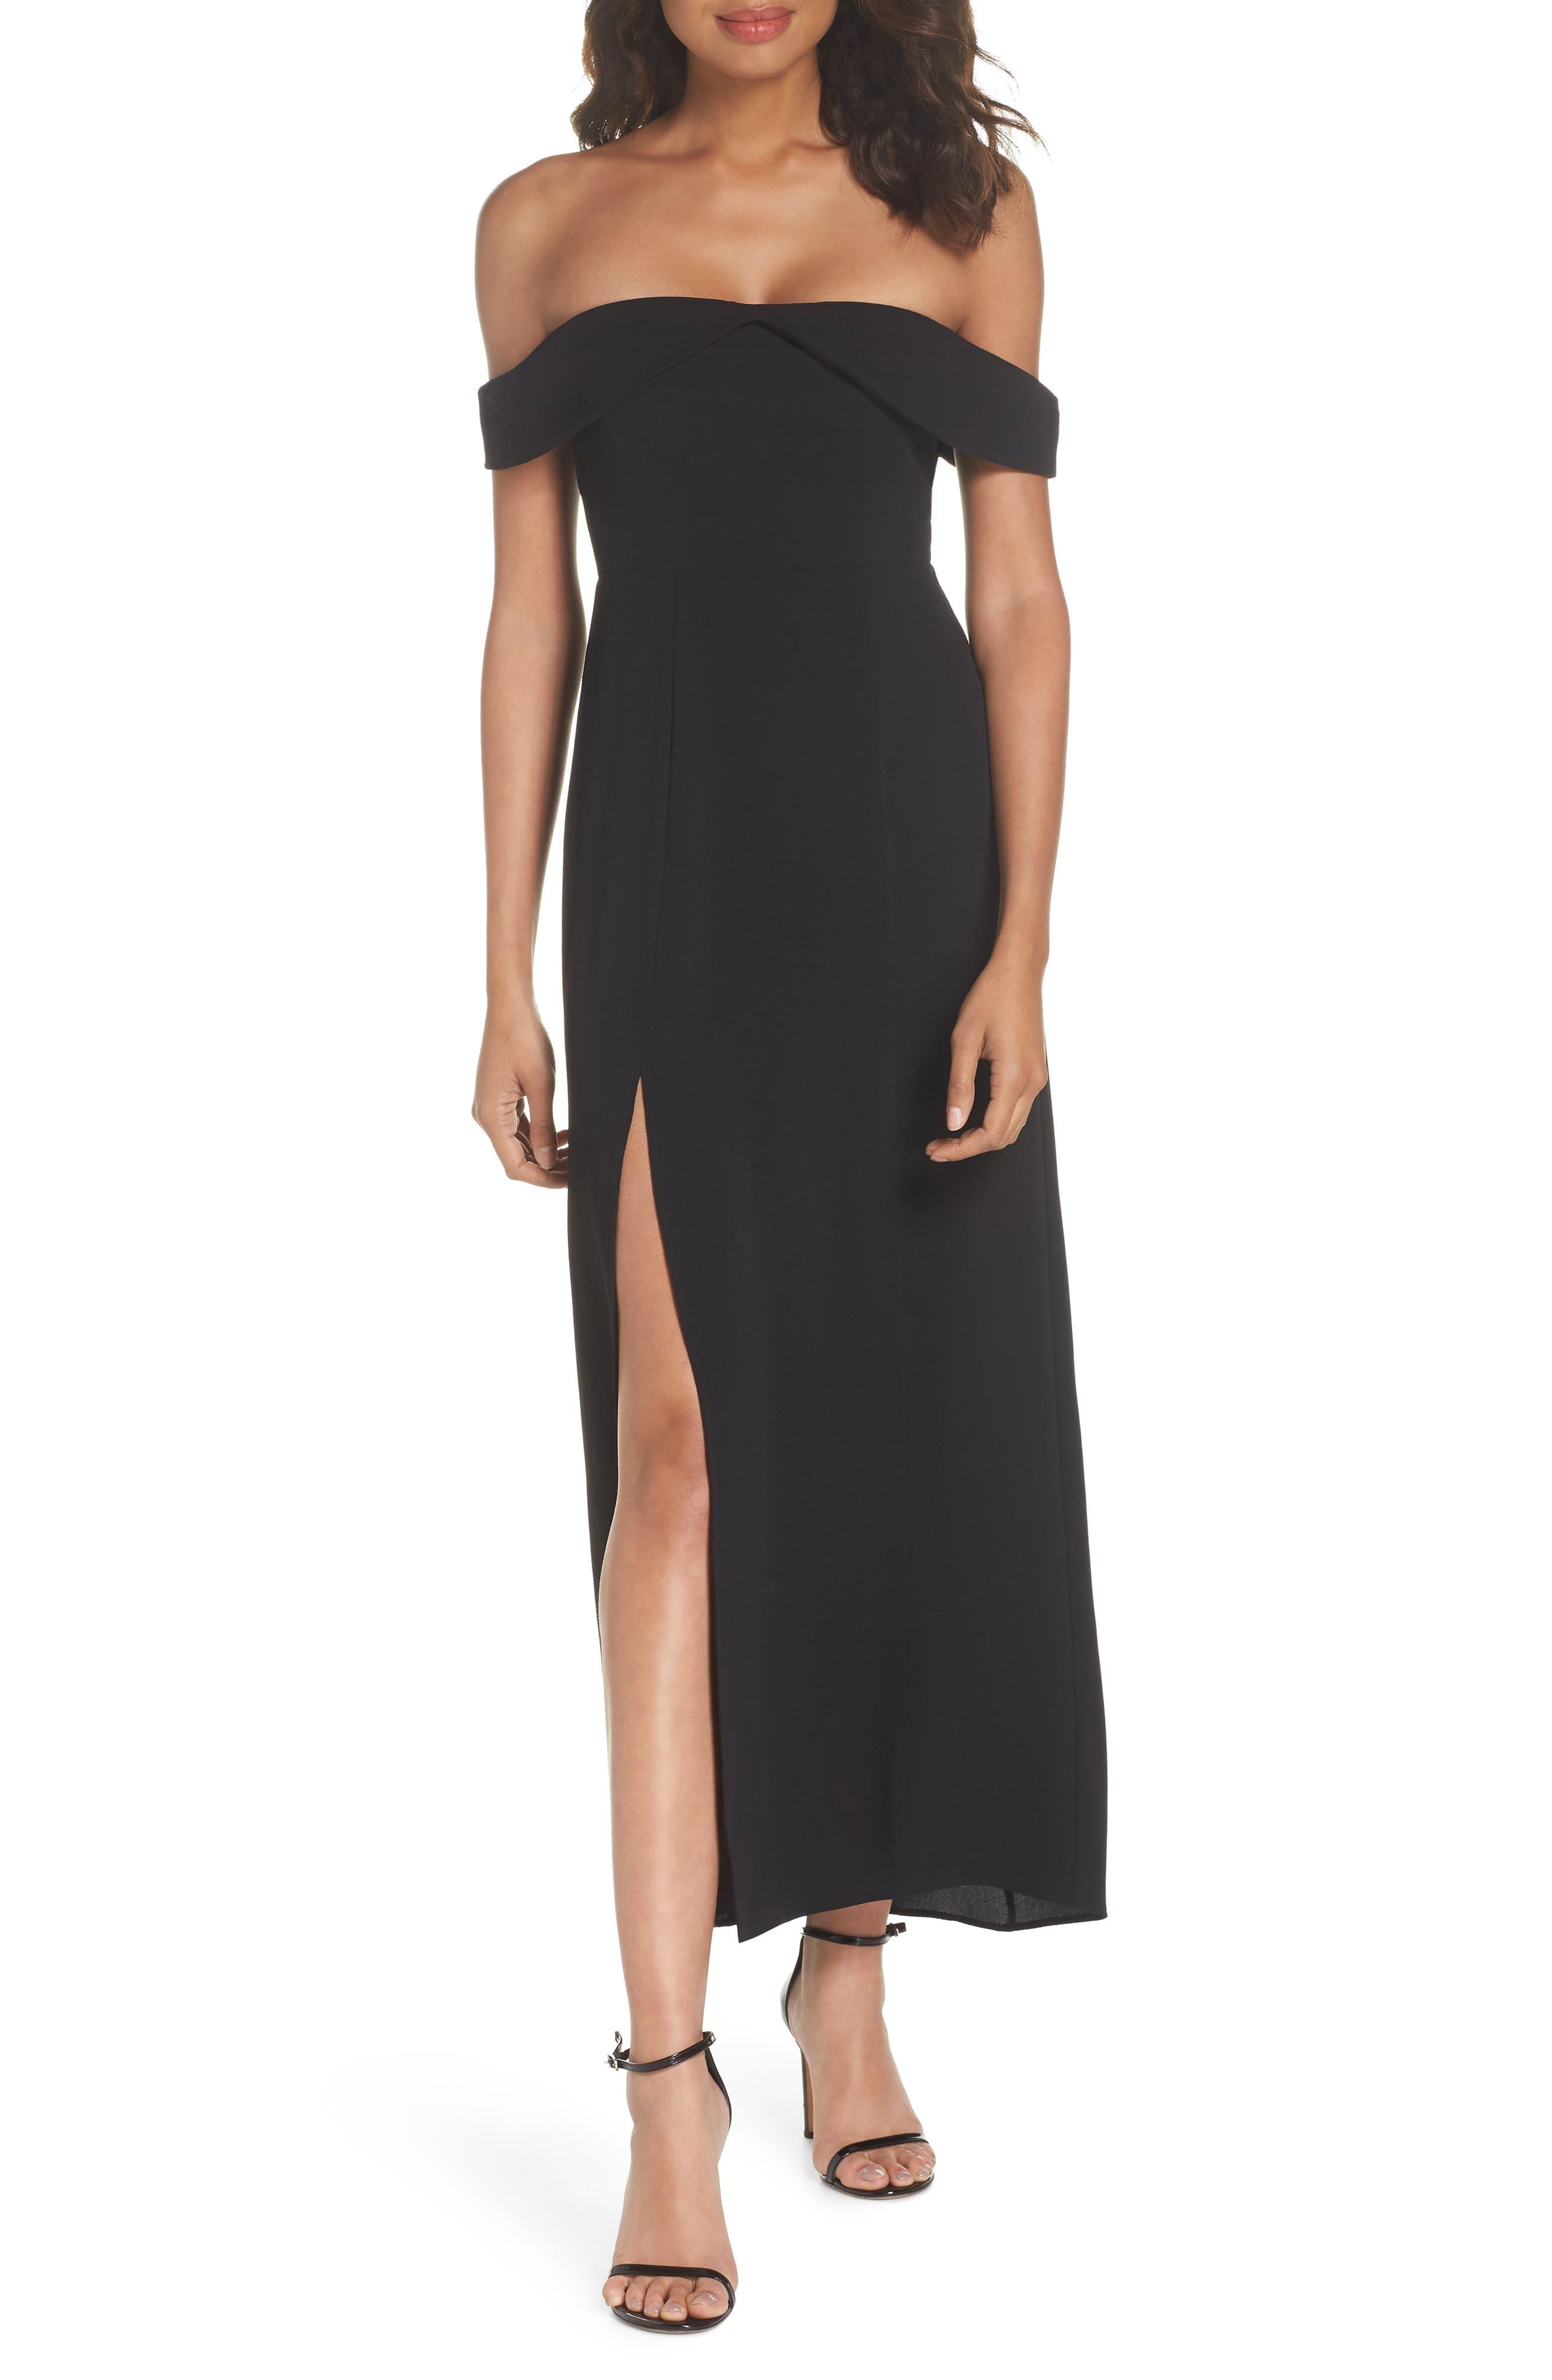 Upton Off the Shoulder Gown,                         Main,                         color, BLACK CRINKLE STRETCH